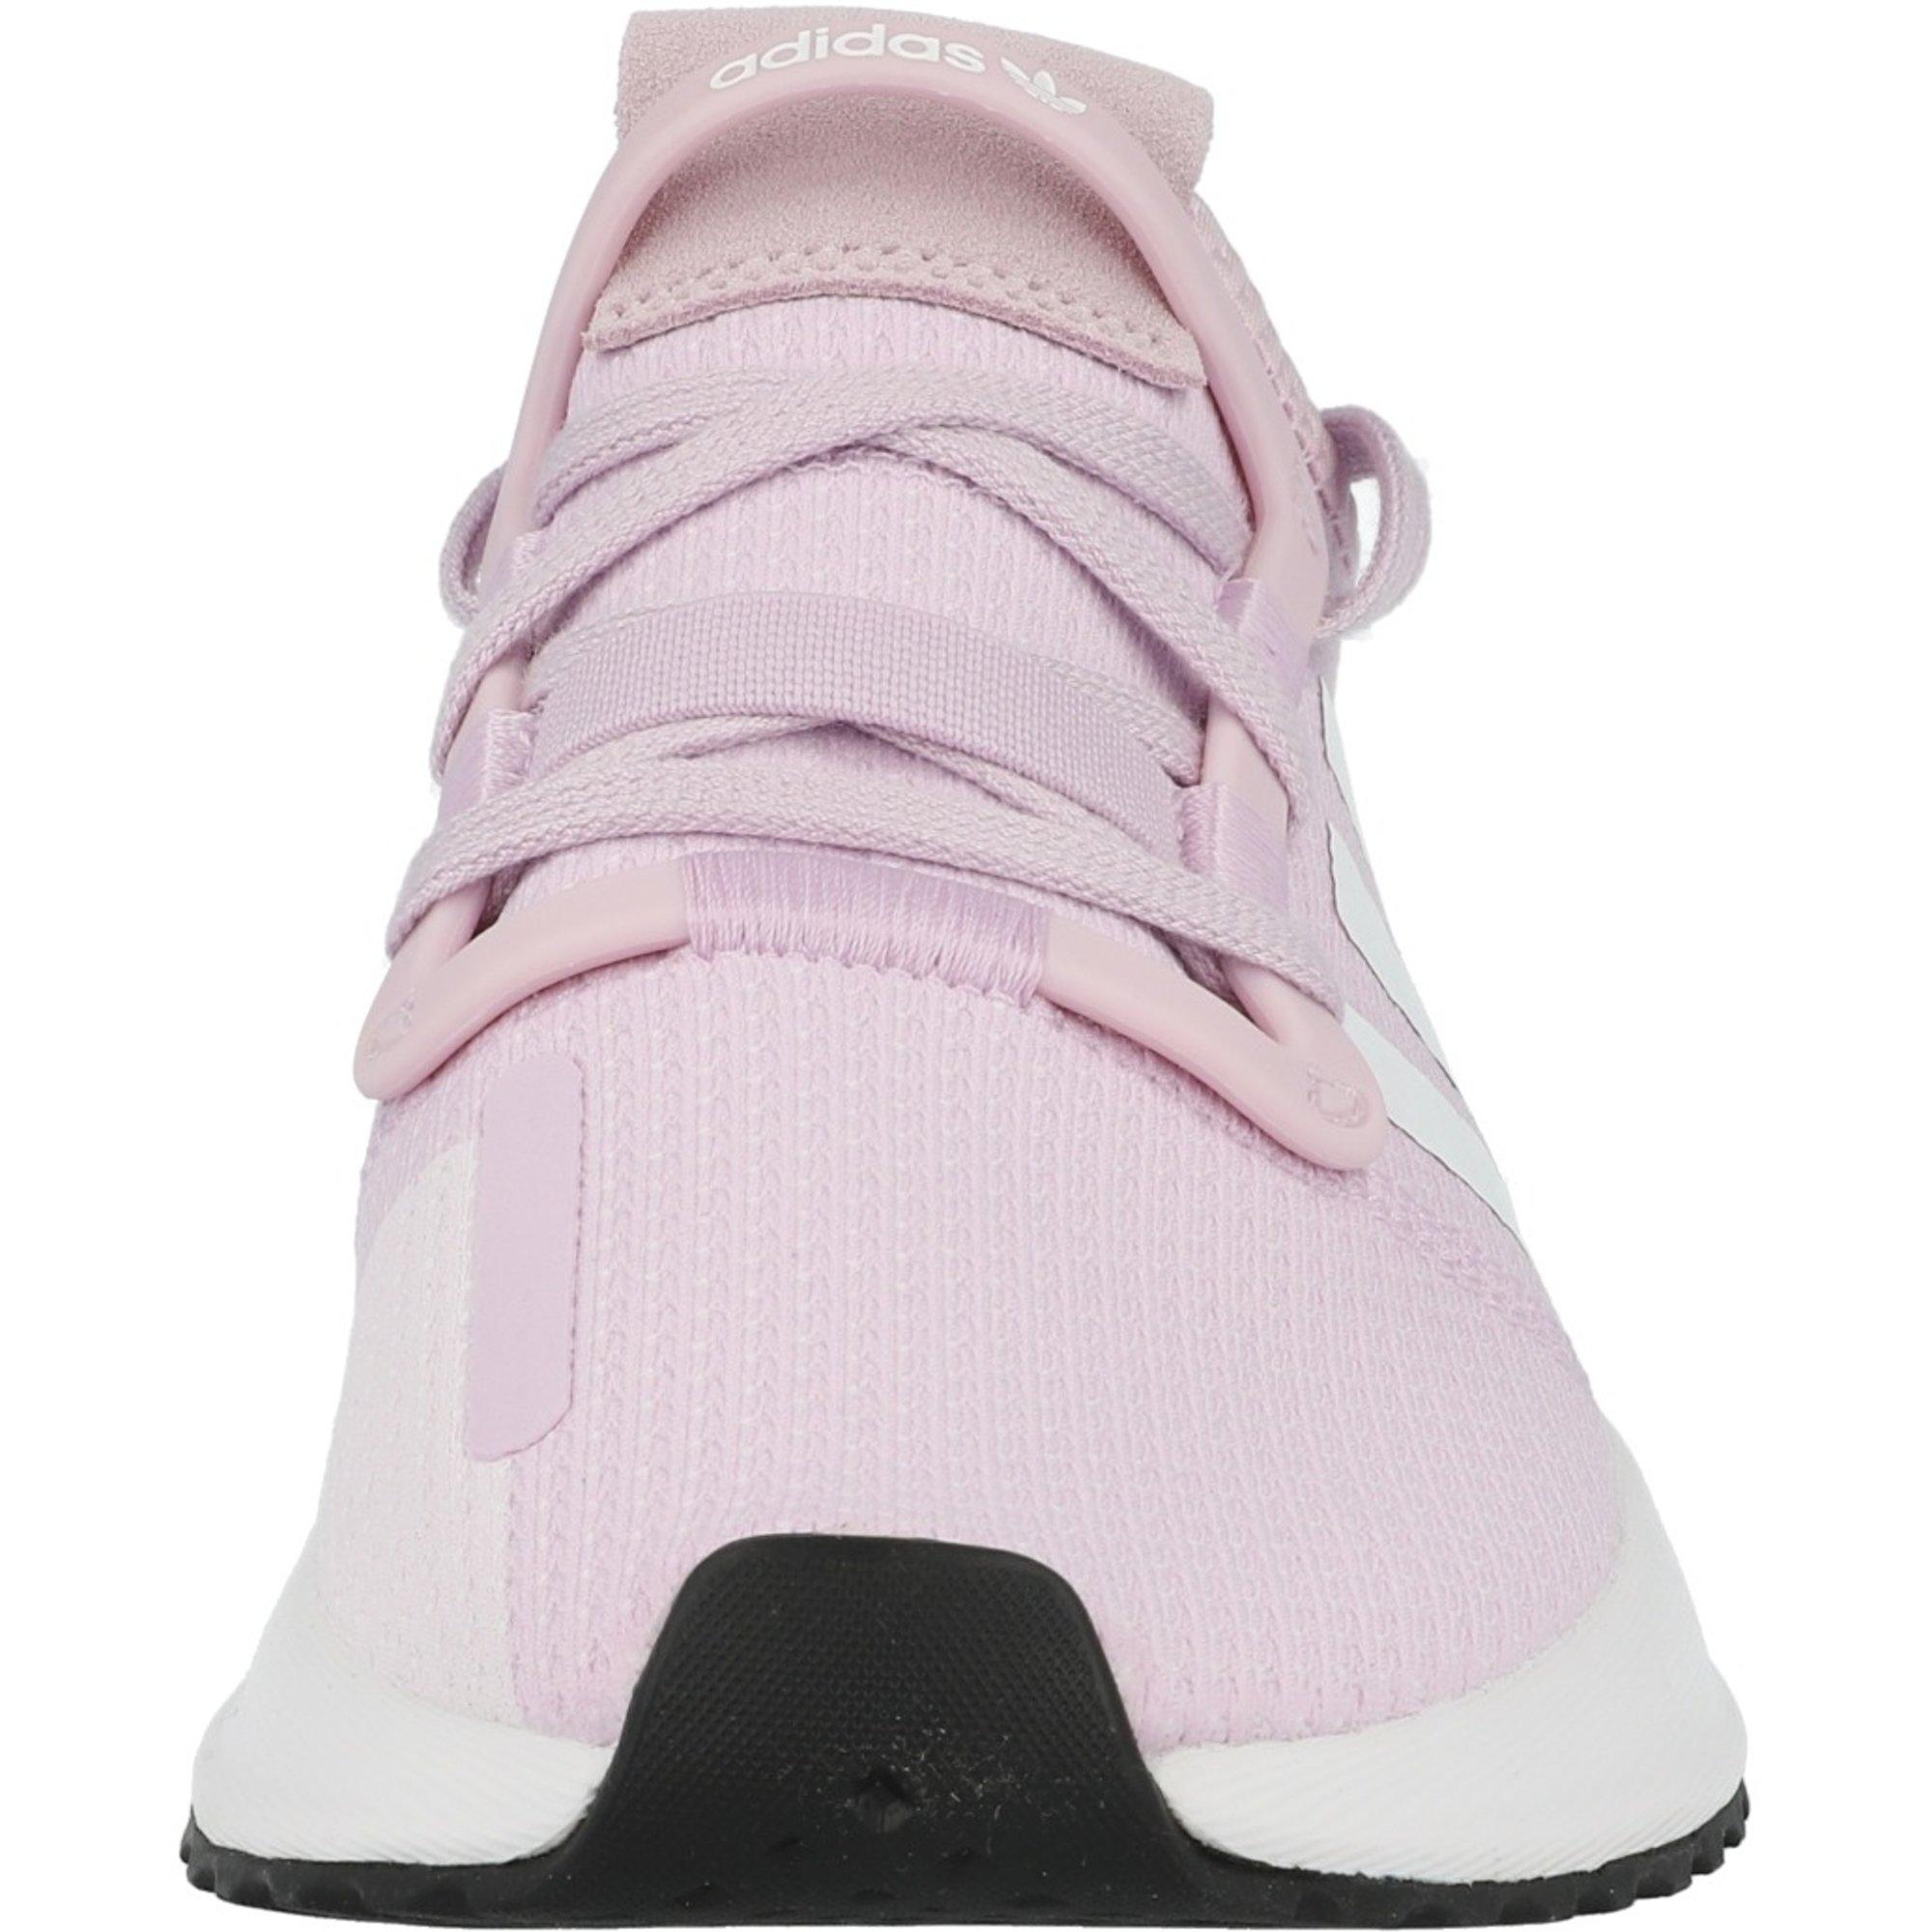 adidas Originals U_Path Run J Aero Pink Textile Youth